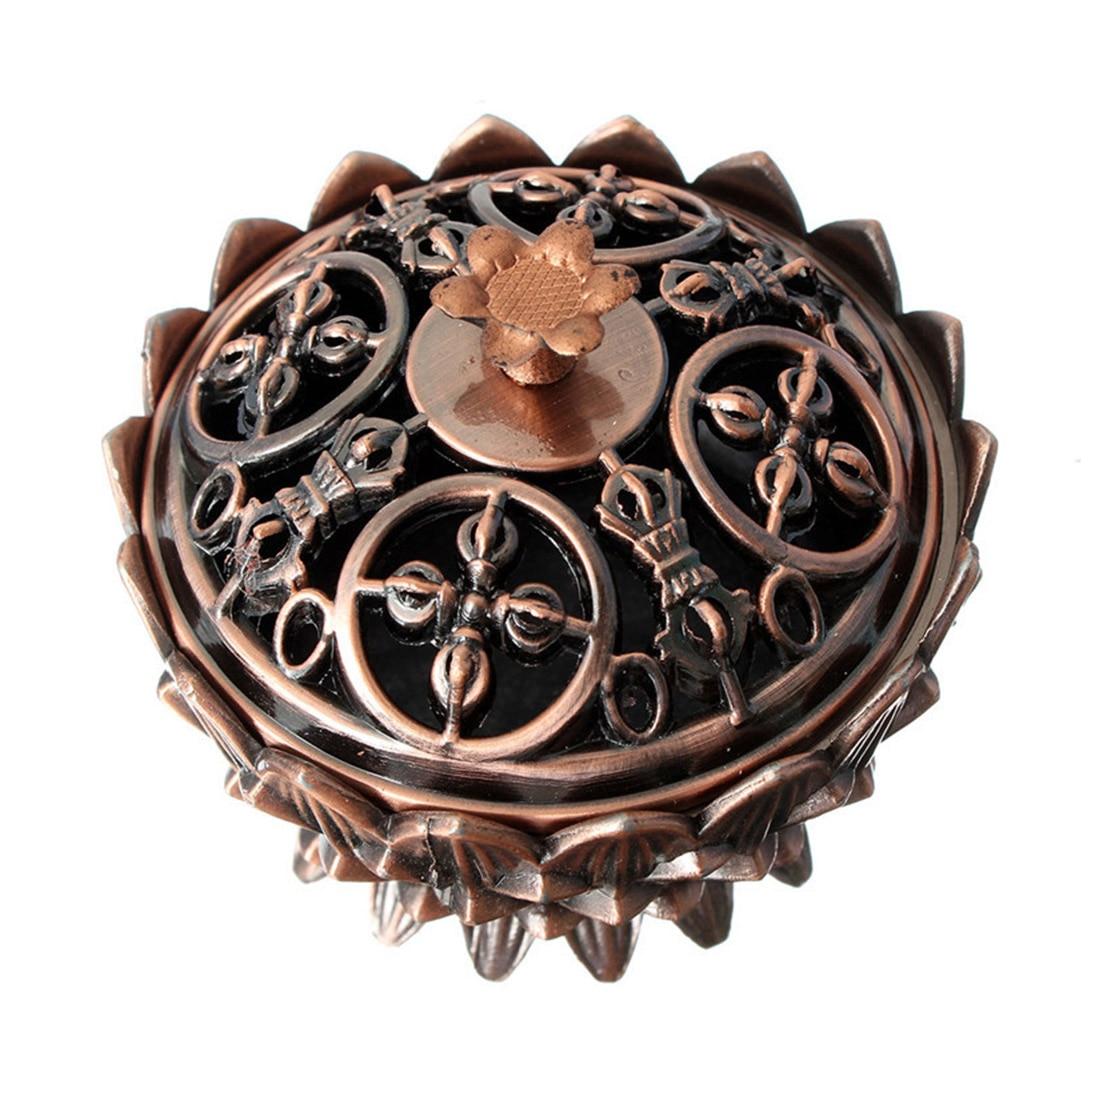 Sacred Lotus Copper Incense Burner 4